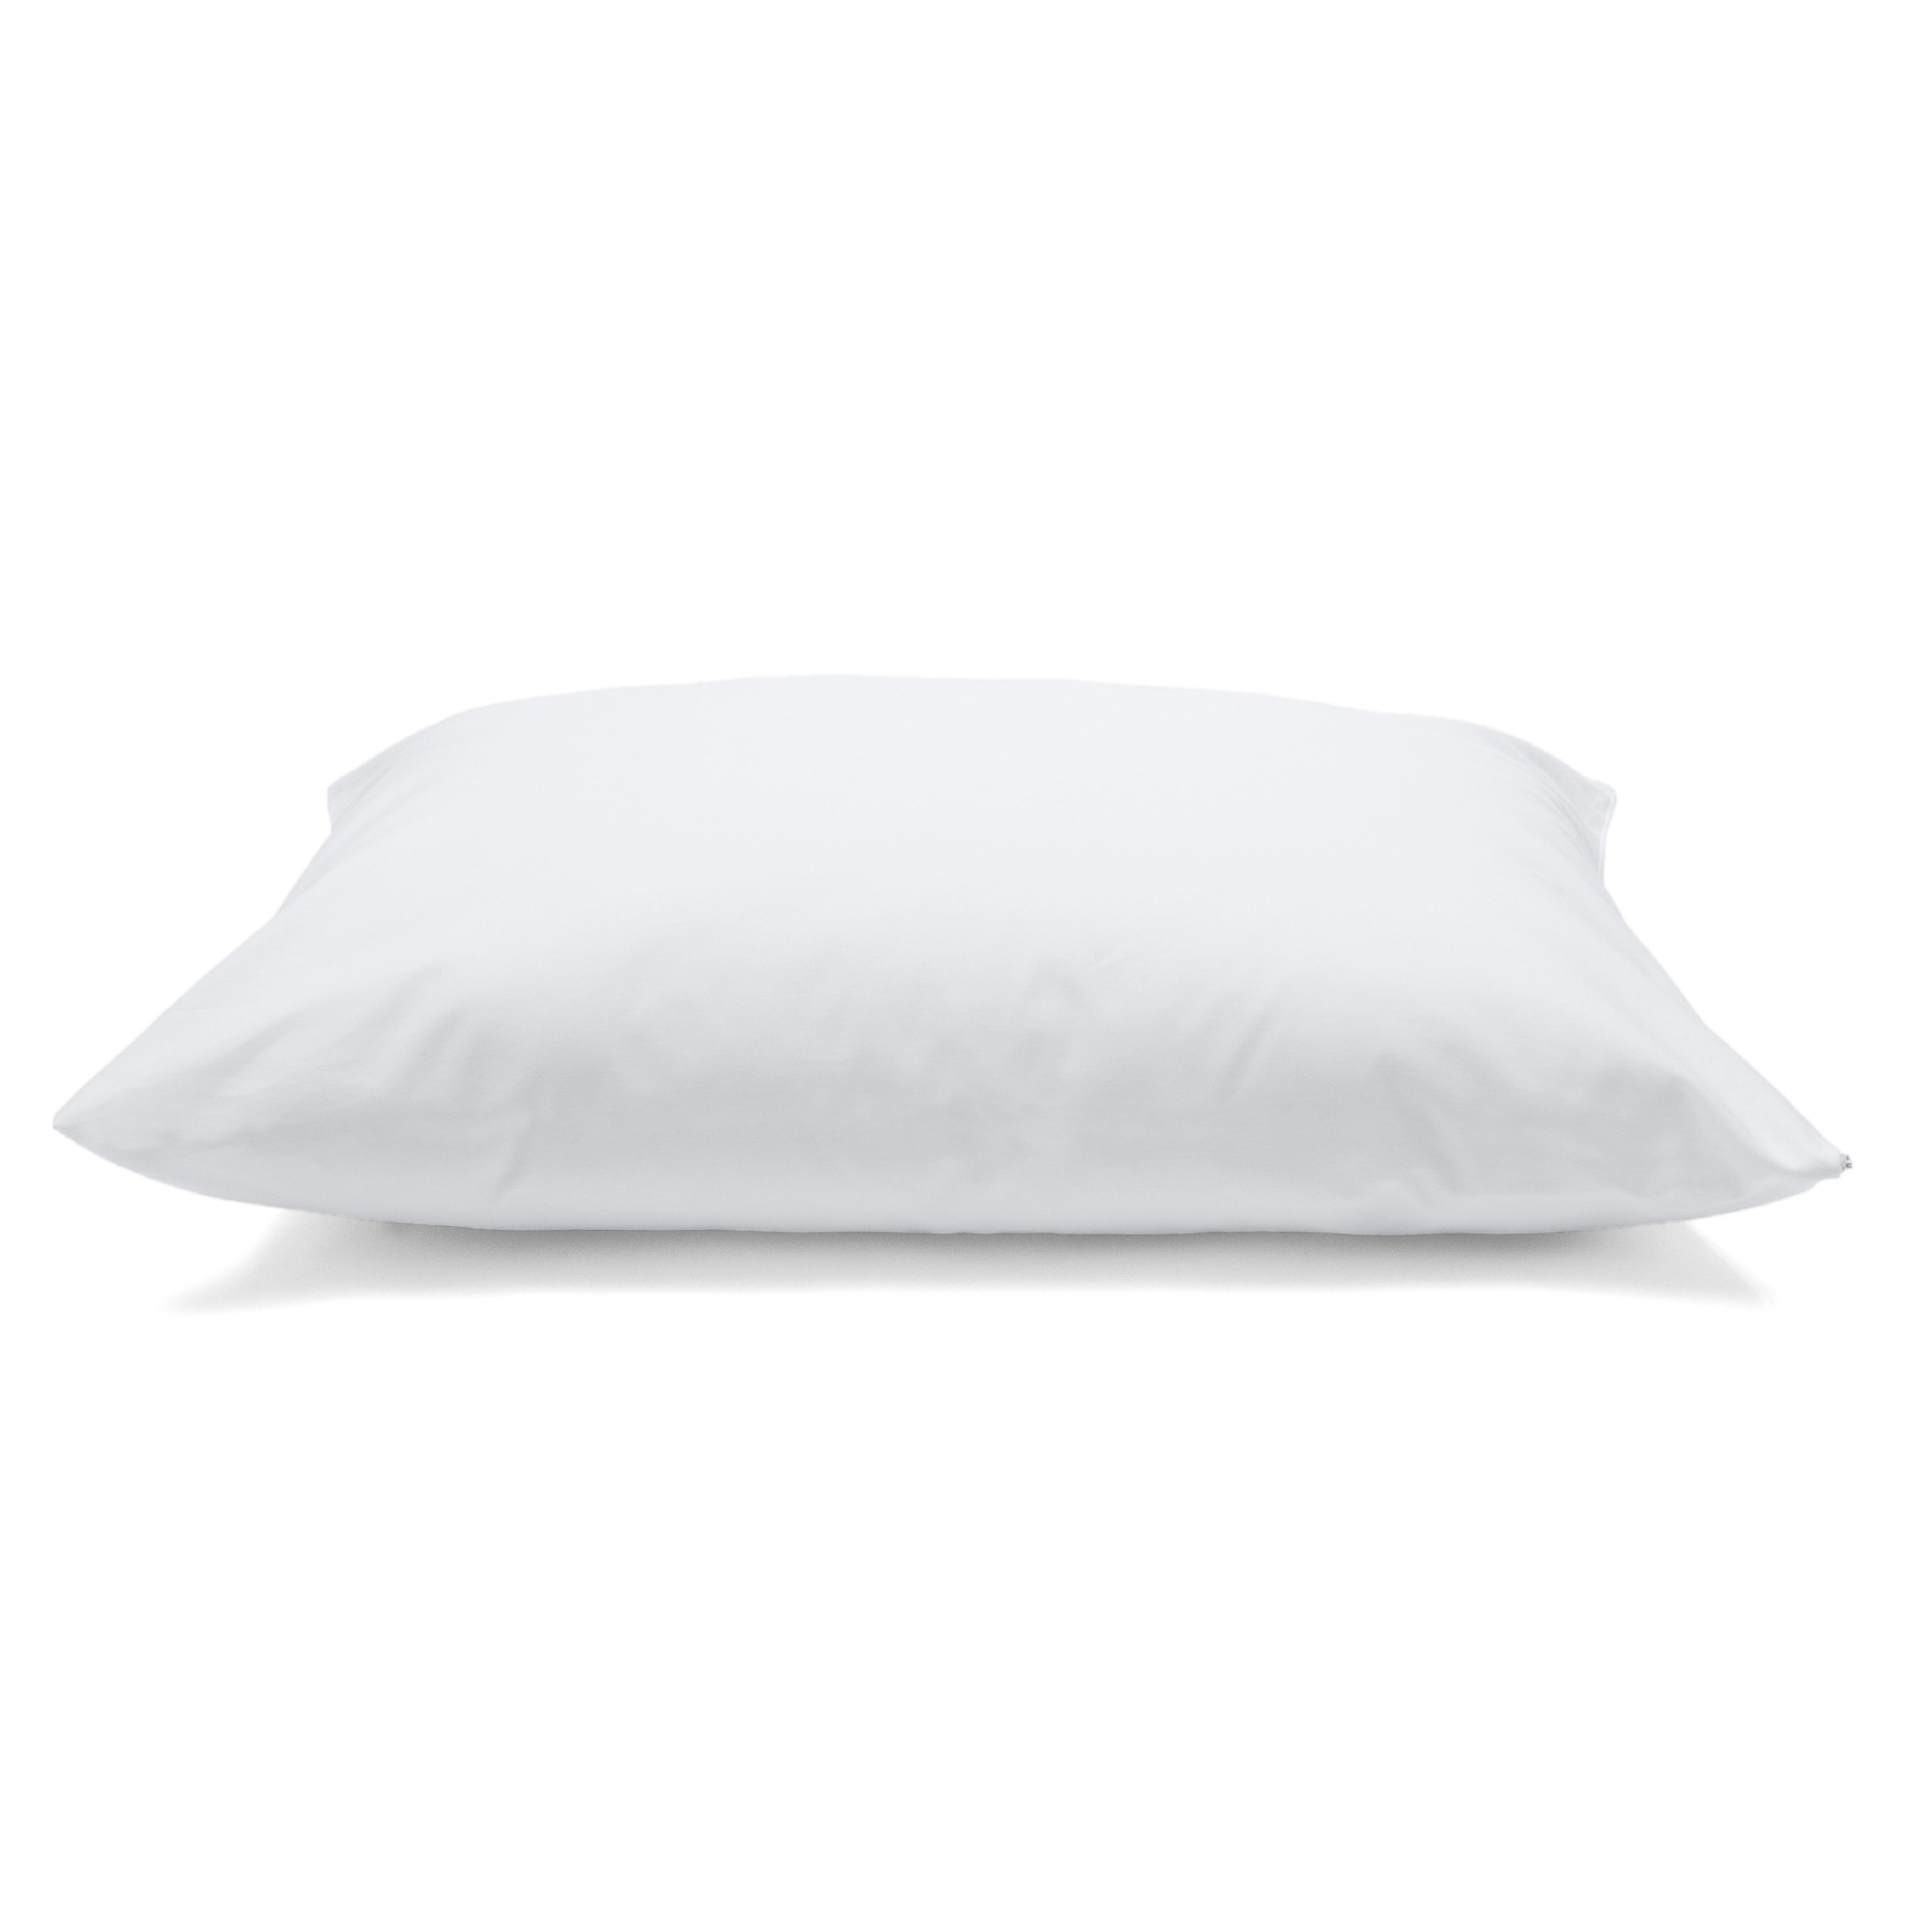 Protetor de Travesseiro Impermeavel 50x70 cm Branco - Buettner